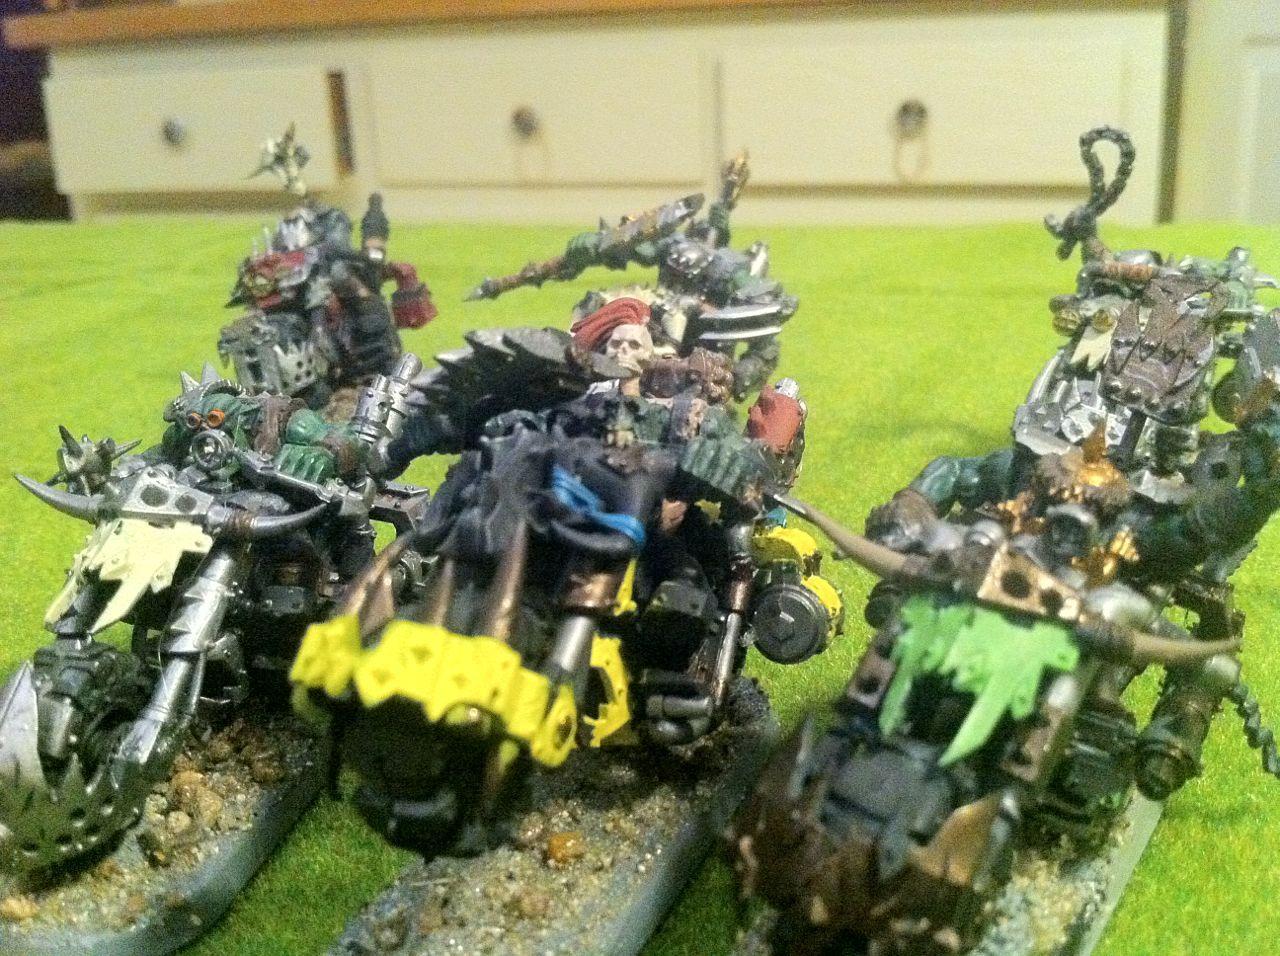 Orks, Snakebite, Warbiker, Warhammer 40,000